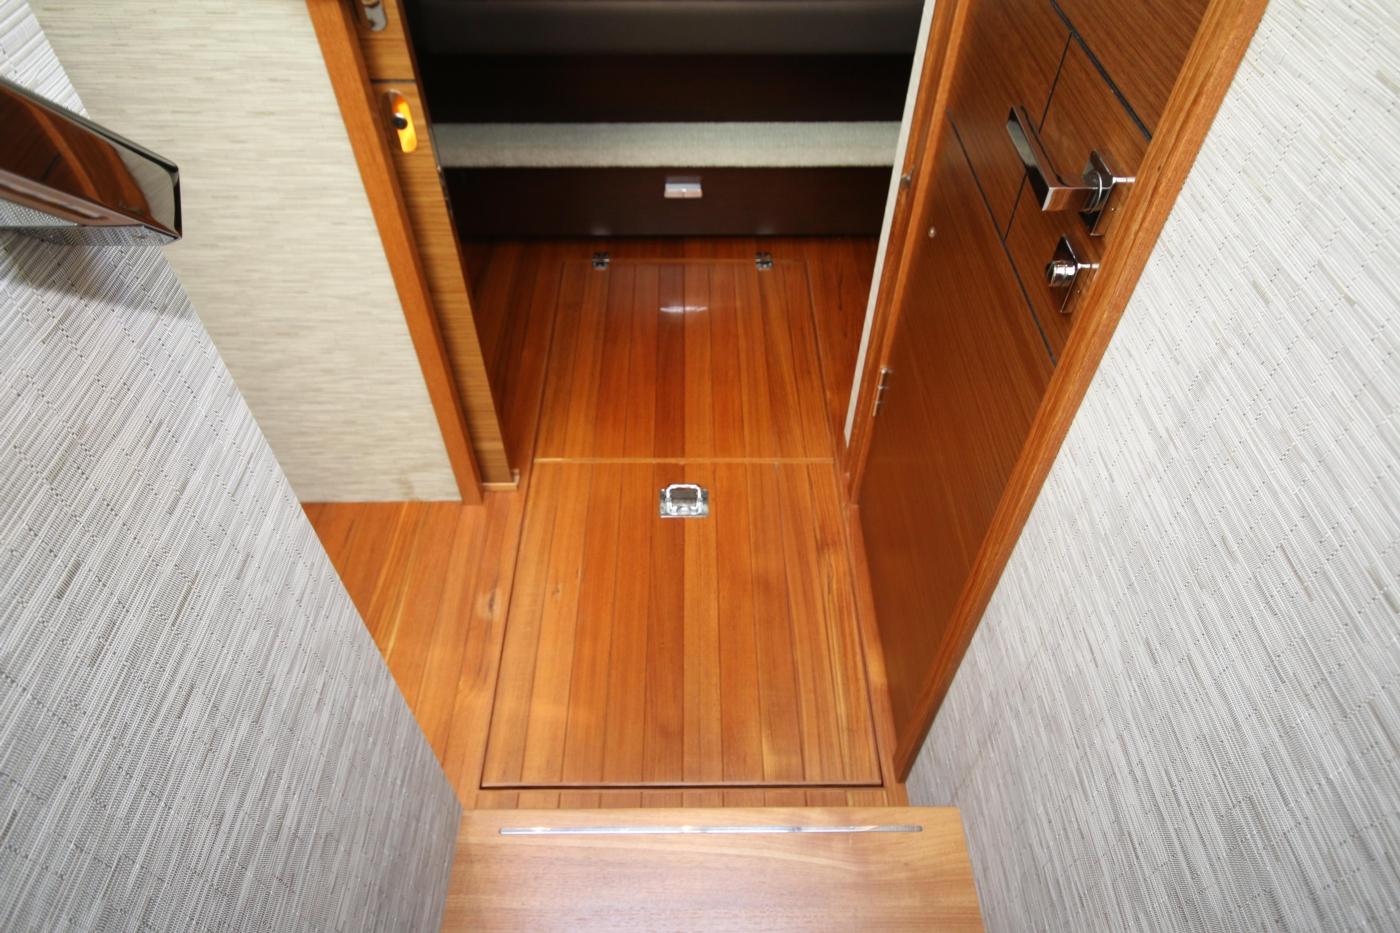 2018 Tiara Yachts 39 Coupe, Atrium